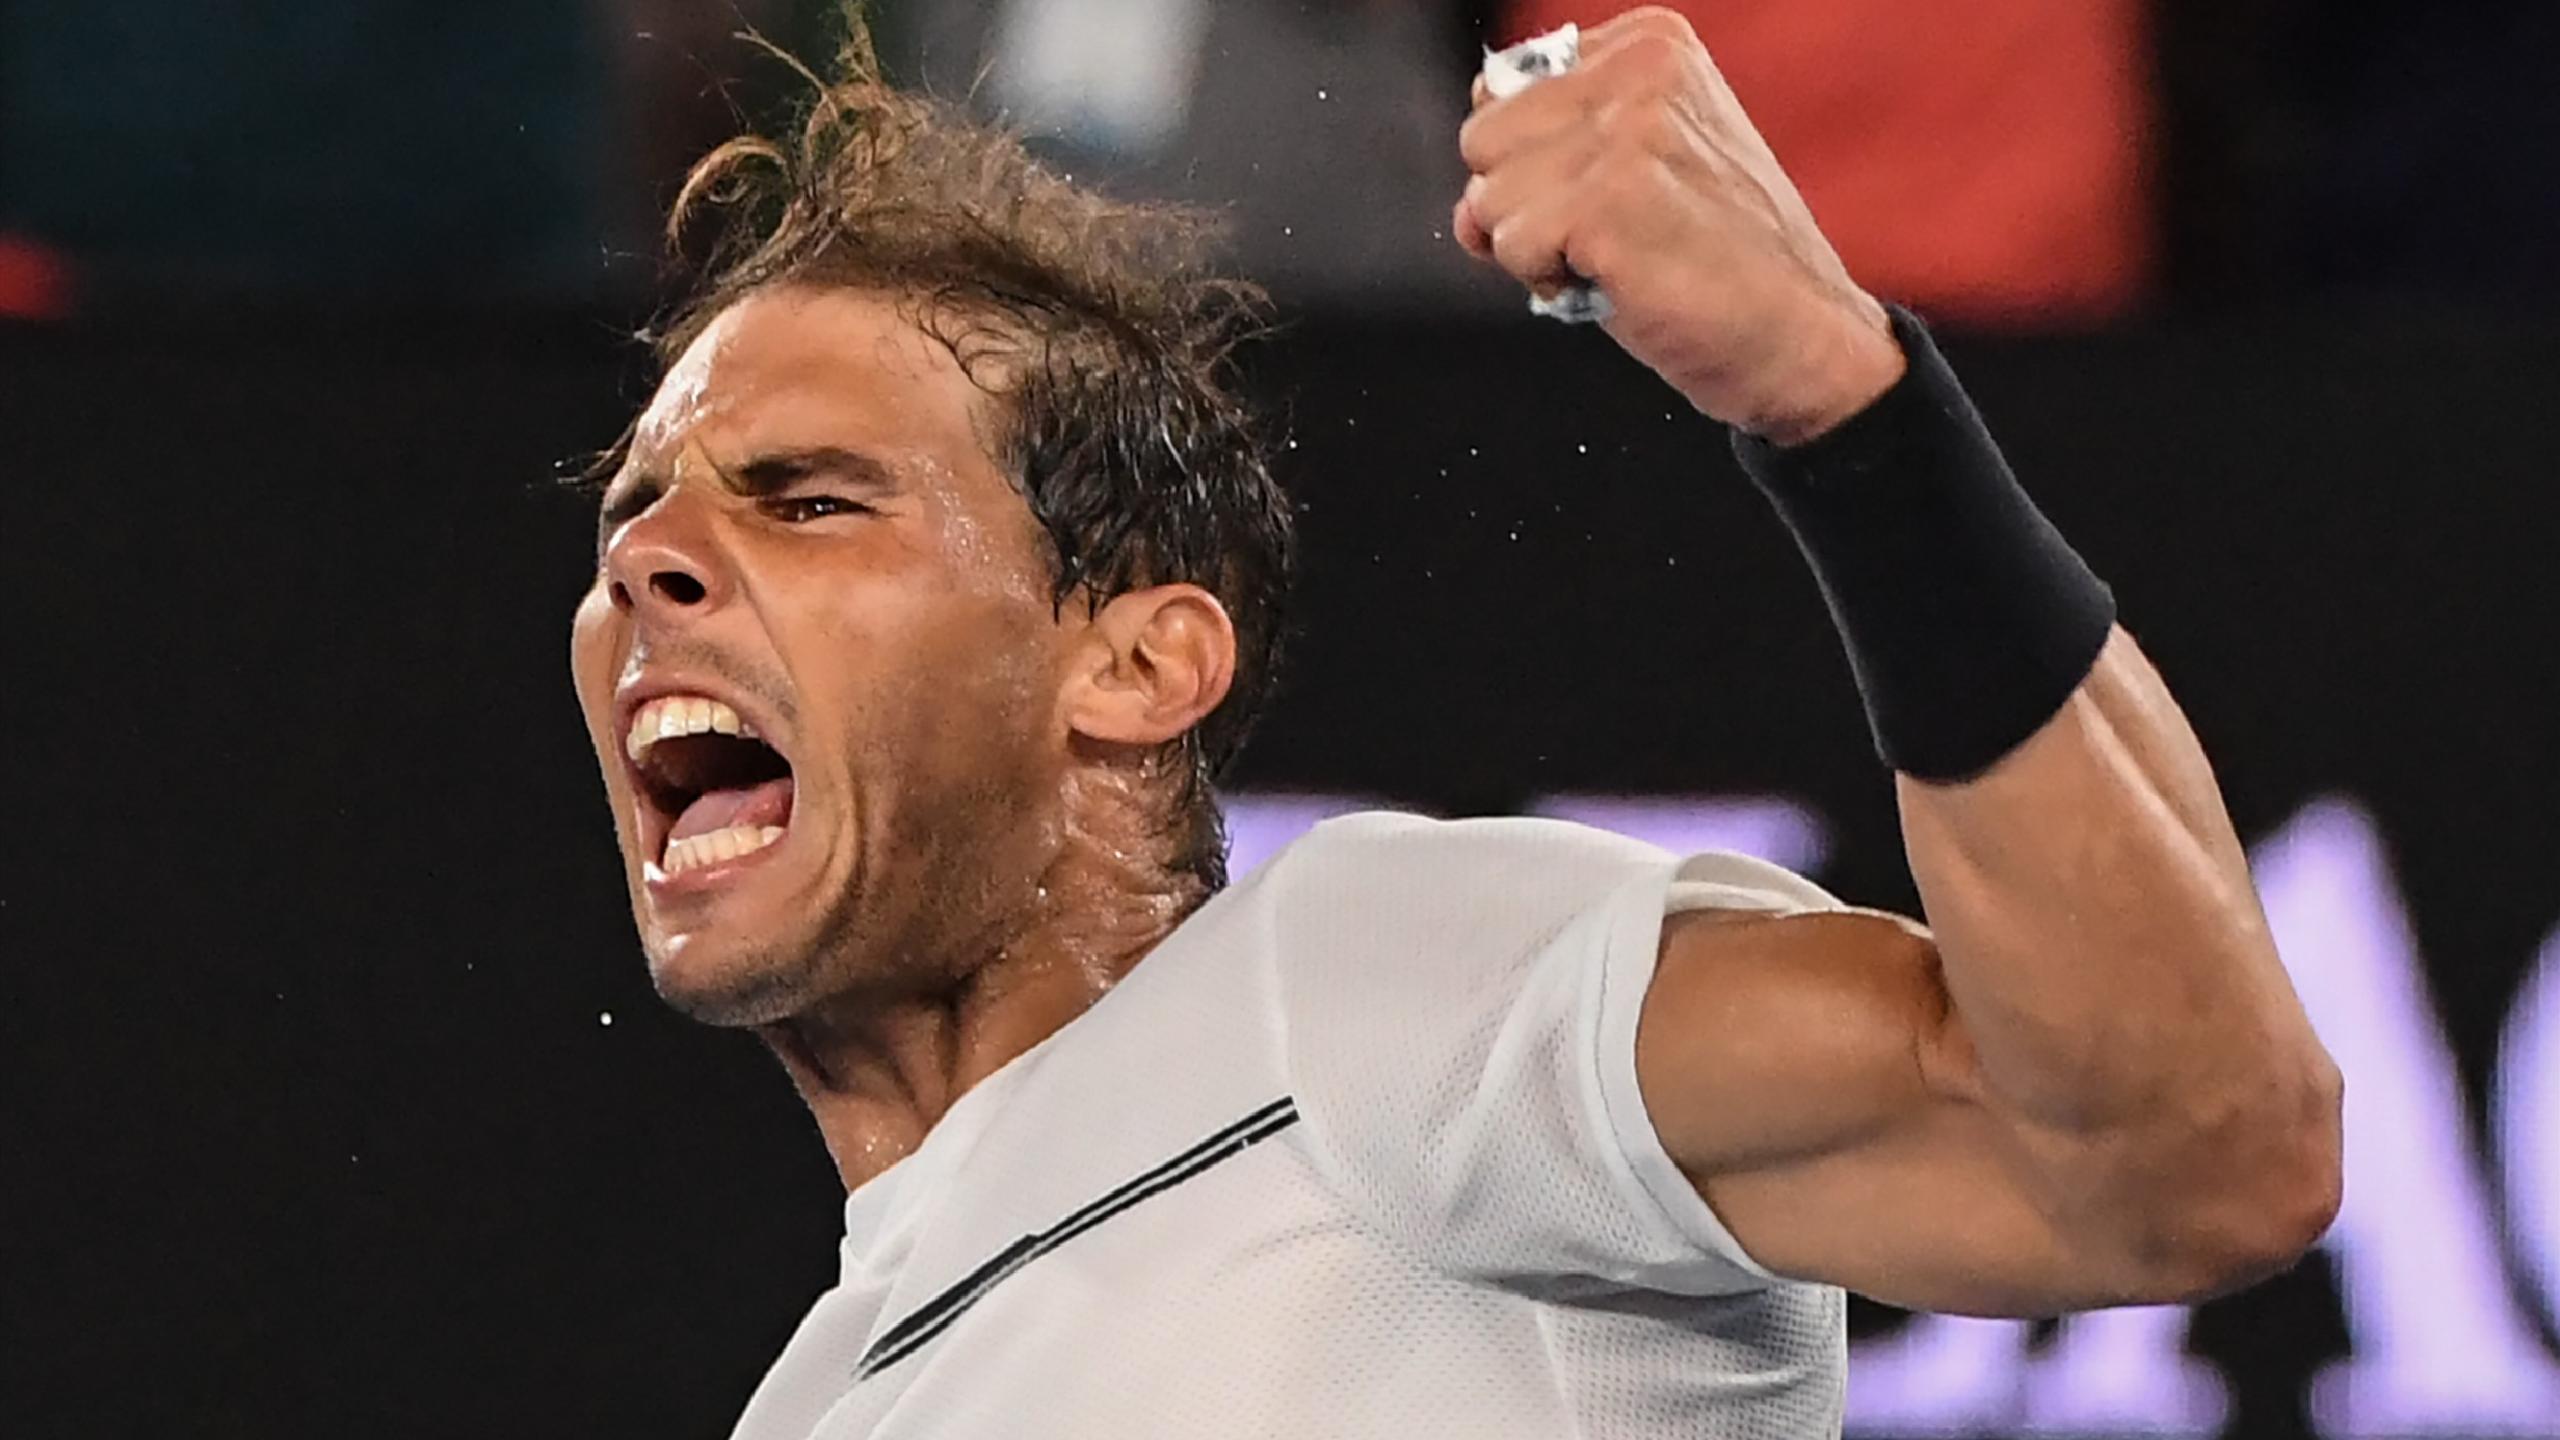 Rafael Nadal celebrates against Milos Raonic at the Australian Open